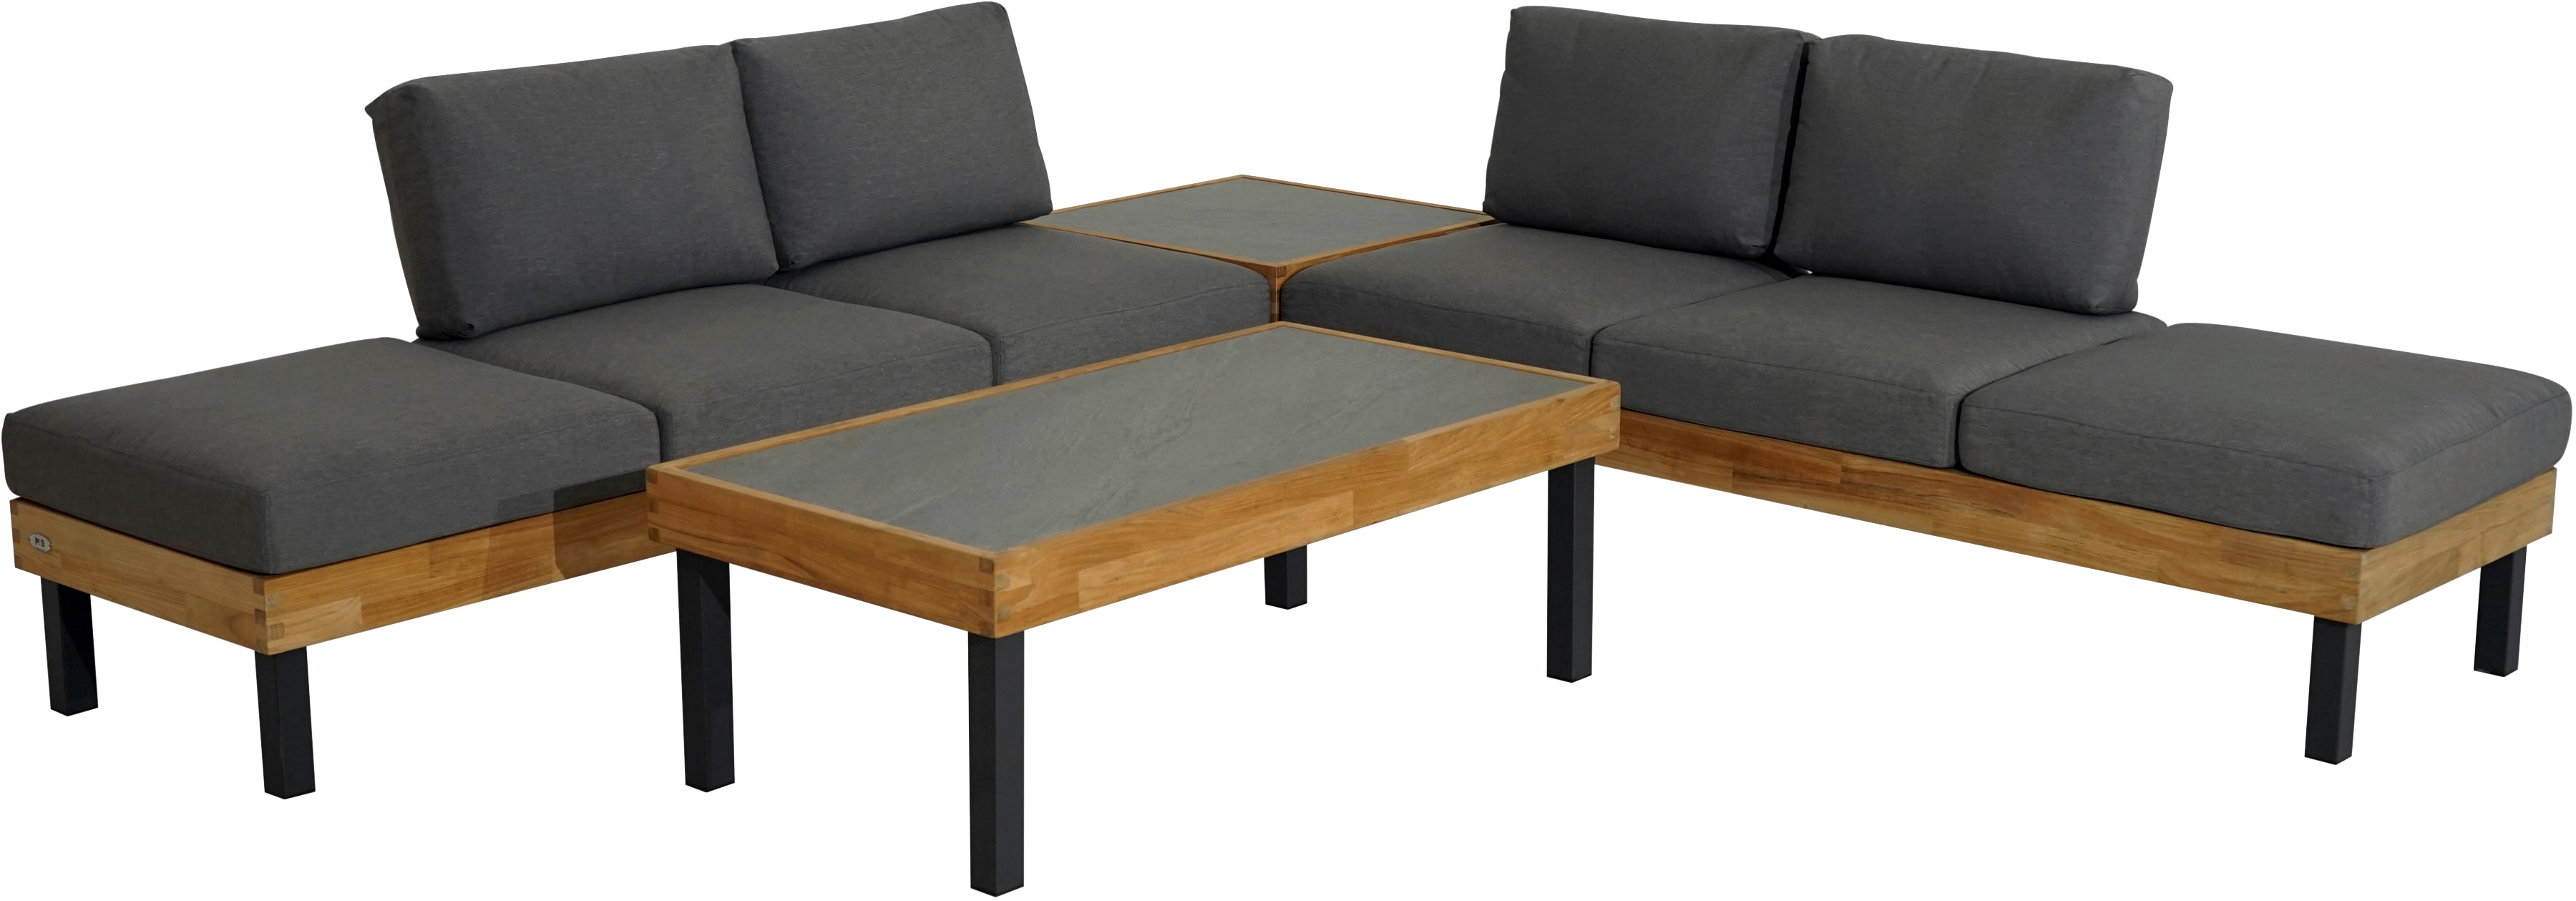 PLOSS Loungeset Skagen 14-tlg 2x 3er Sofas 2x Tische Alu/Teak inkl Auflagen